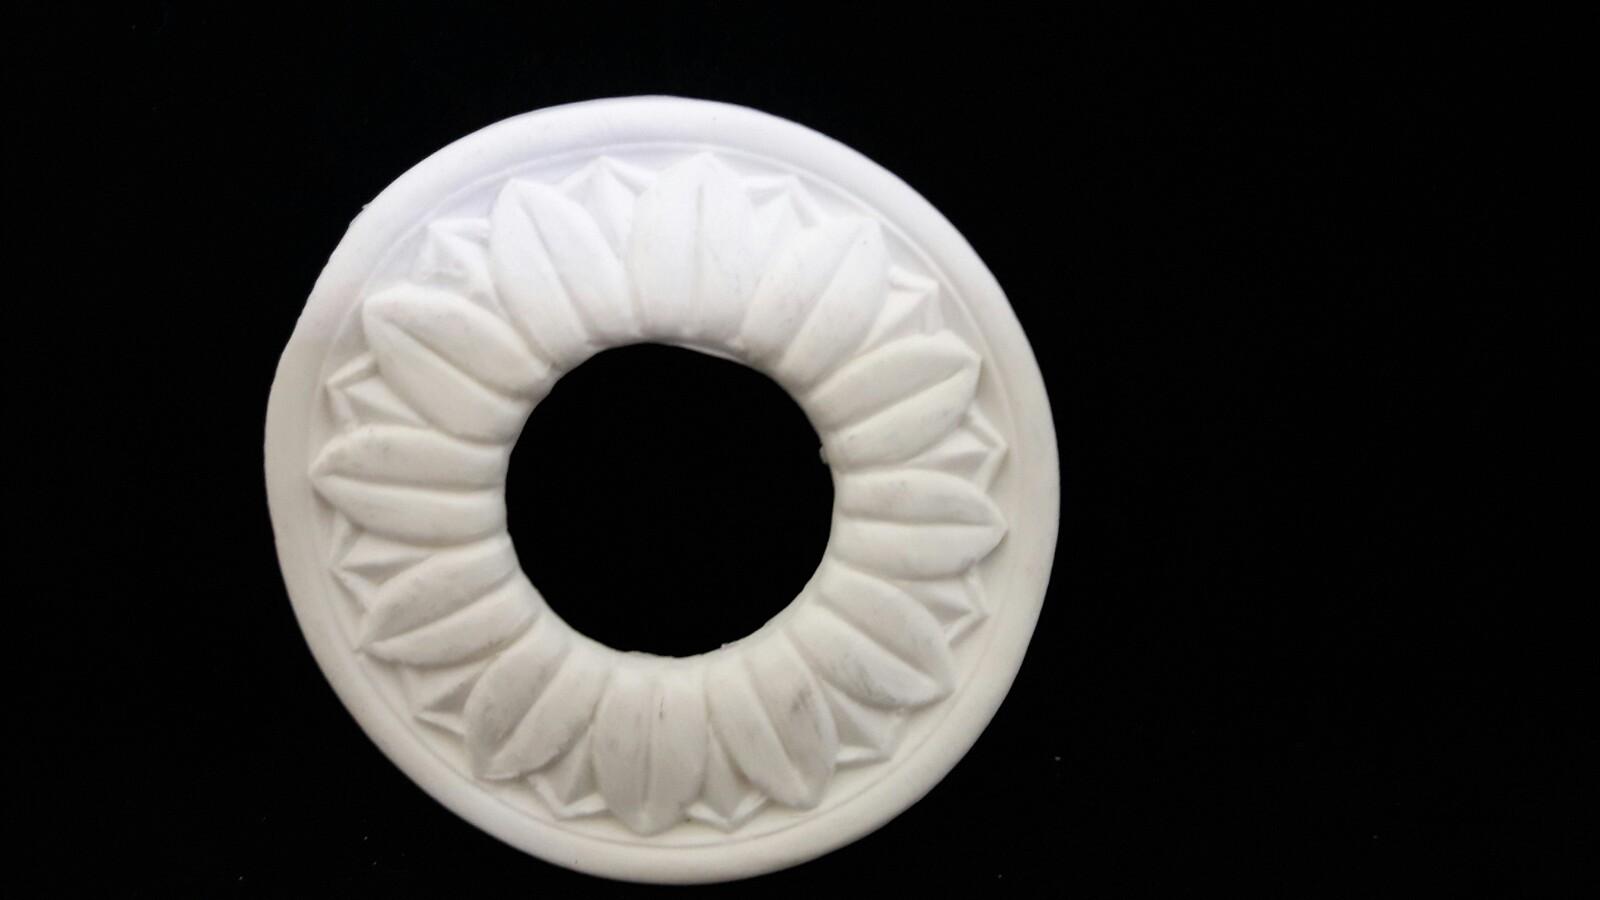 Adorno Valeria 9,5x9,5 cms - 1